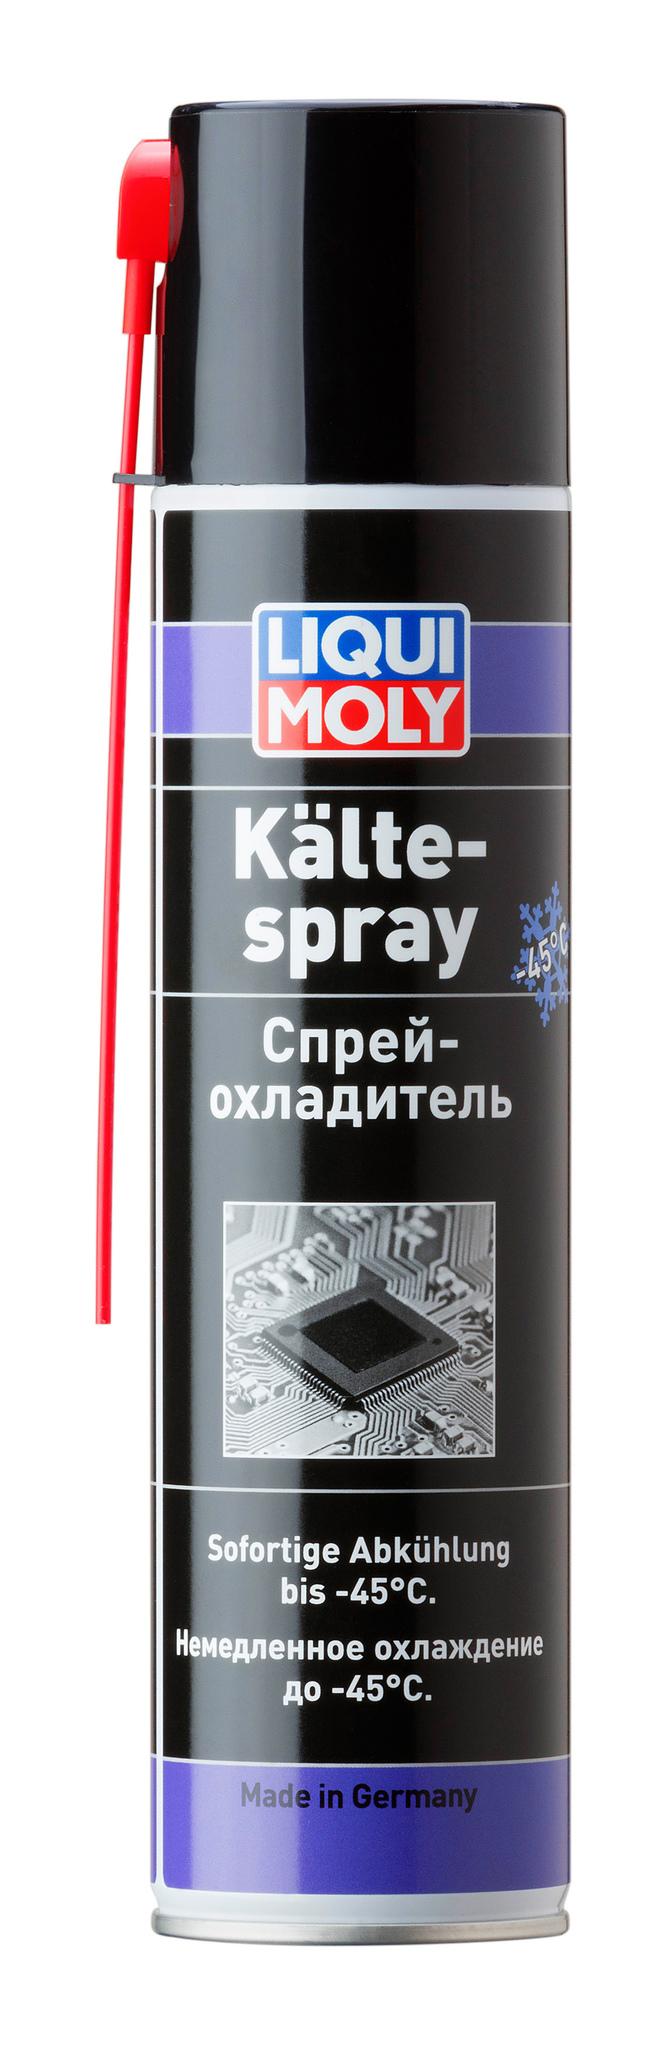 Liqui Moly Kalte-Spray - Спрей - охладитель (0.400л)